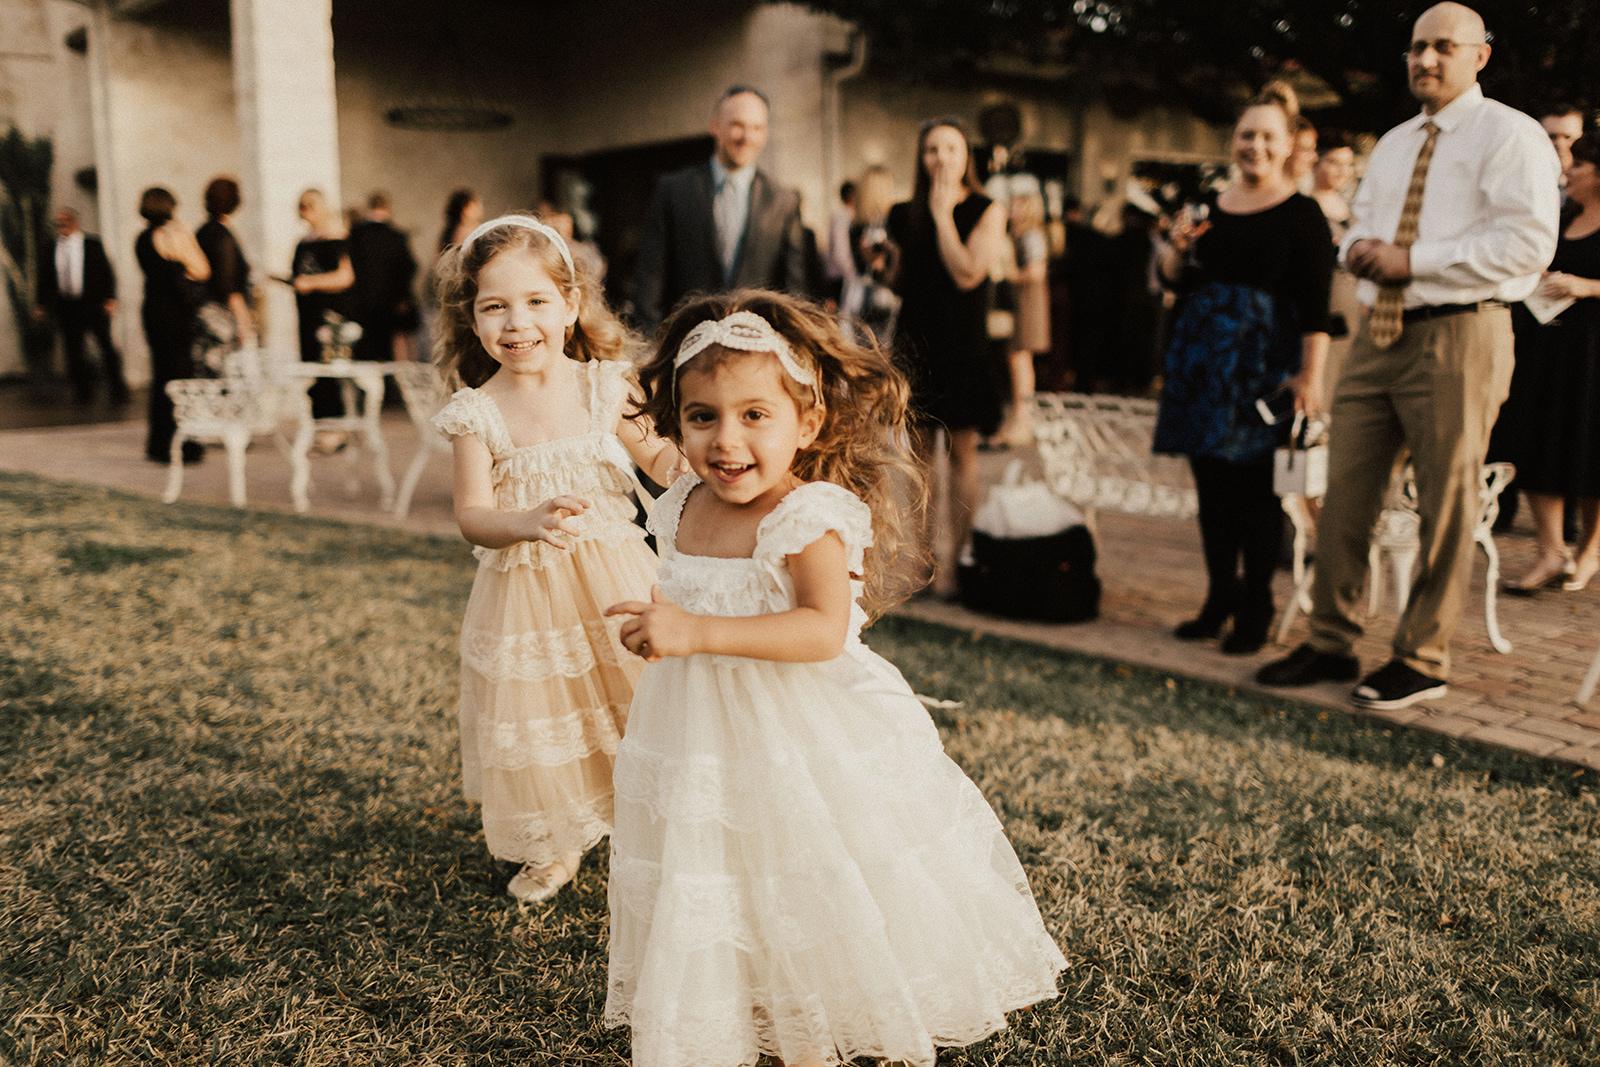 allie-tyler-vintage-villas-austin-texas-wedding-photographer-3726.jpg